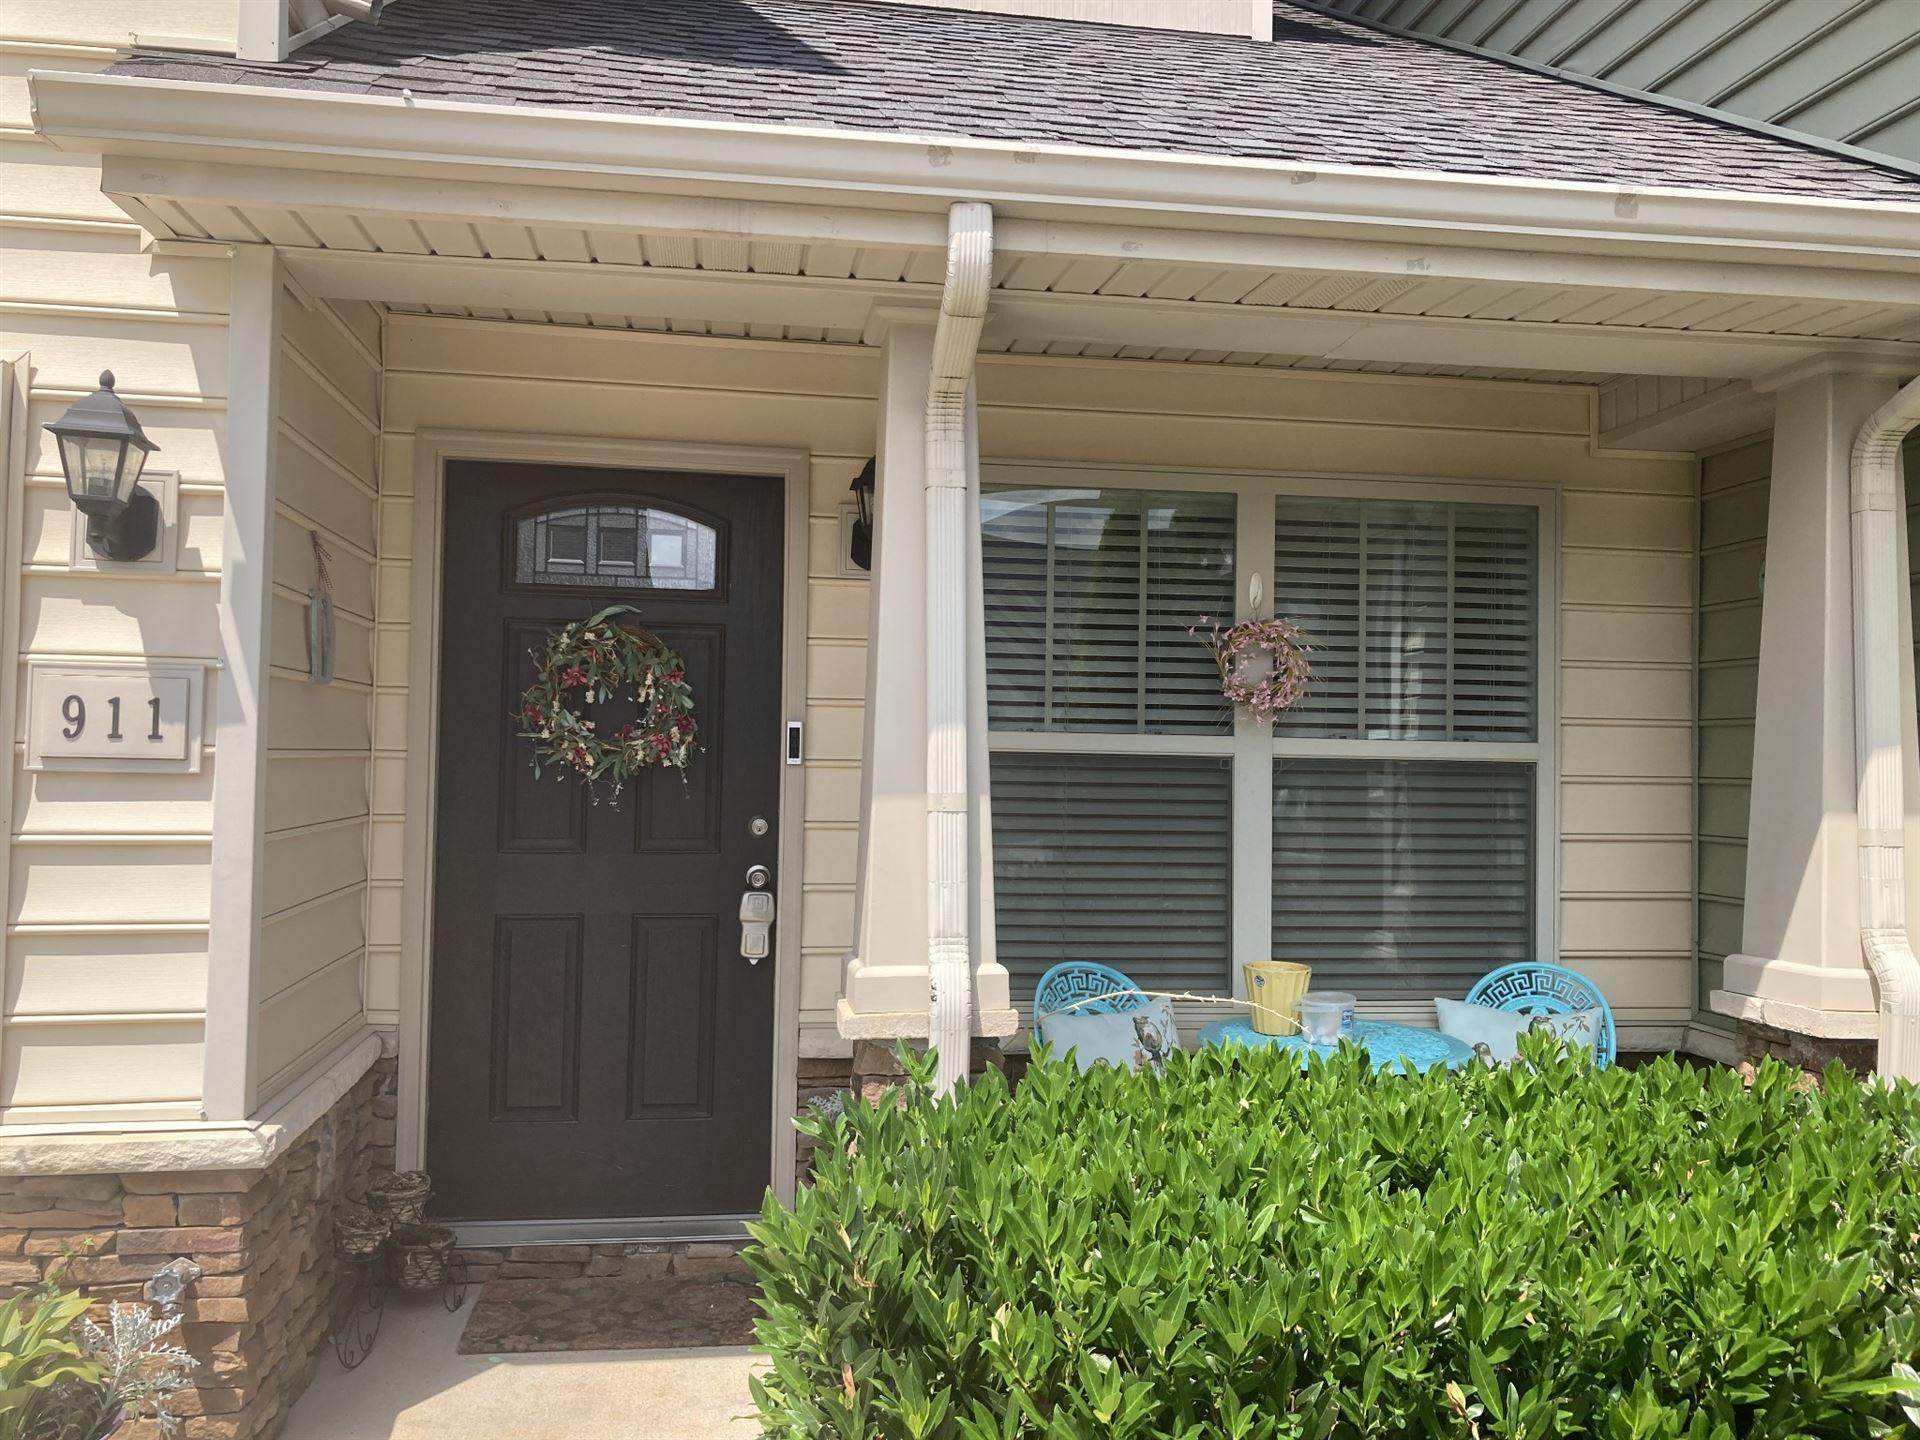 911 Keepsake Diamond Ln, Murfreesboro, TN 37128 - MLS#: 2278998